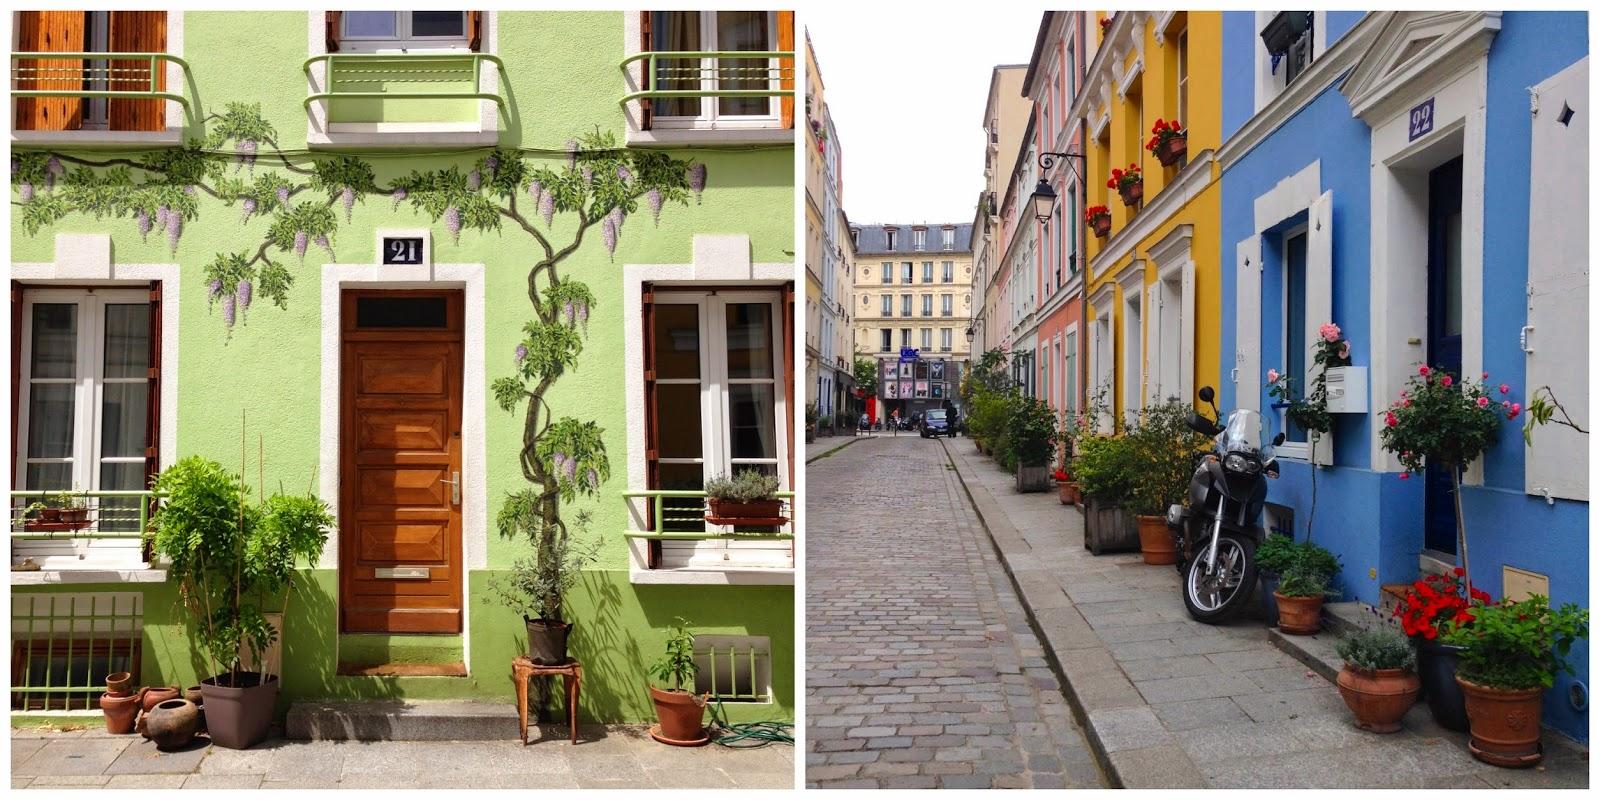 I colori di Rue Cremieux a Parigi - foto di Elisa Chisana Hoshi